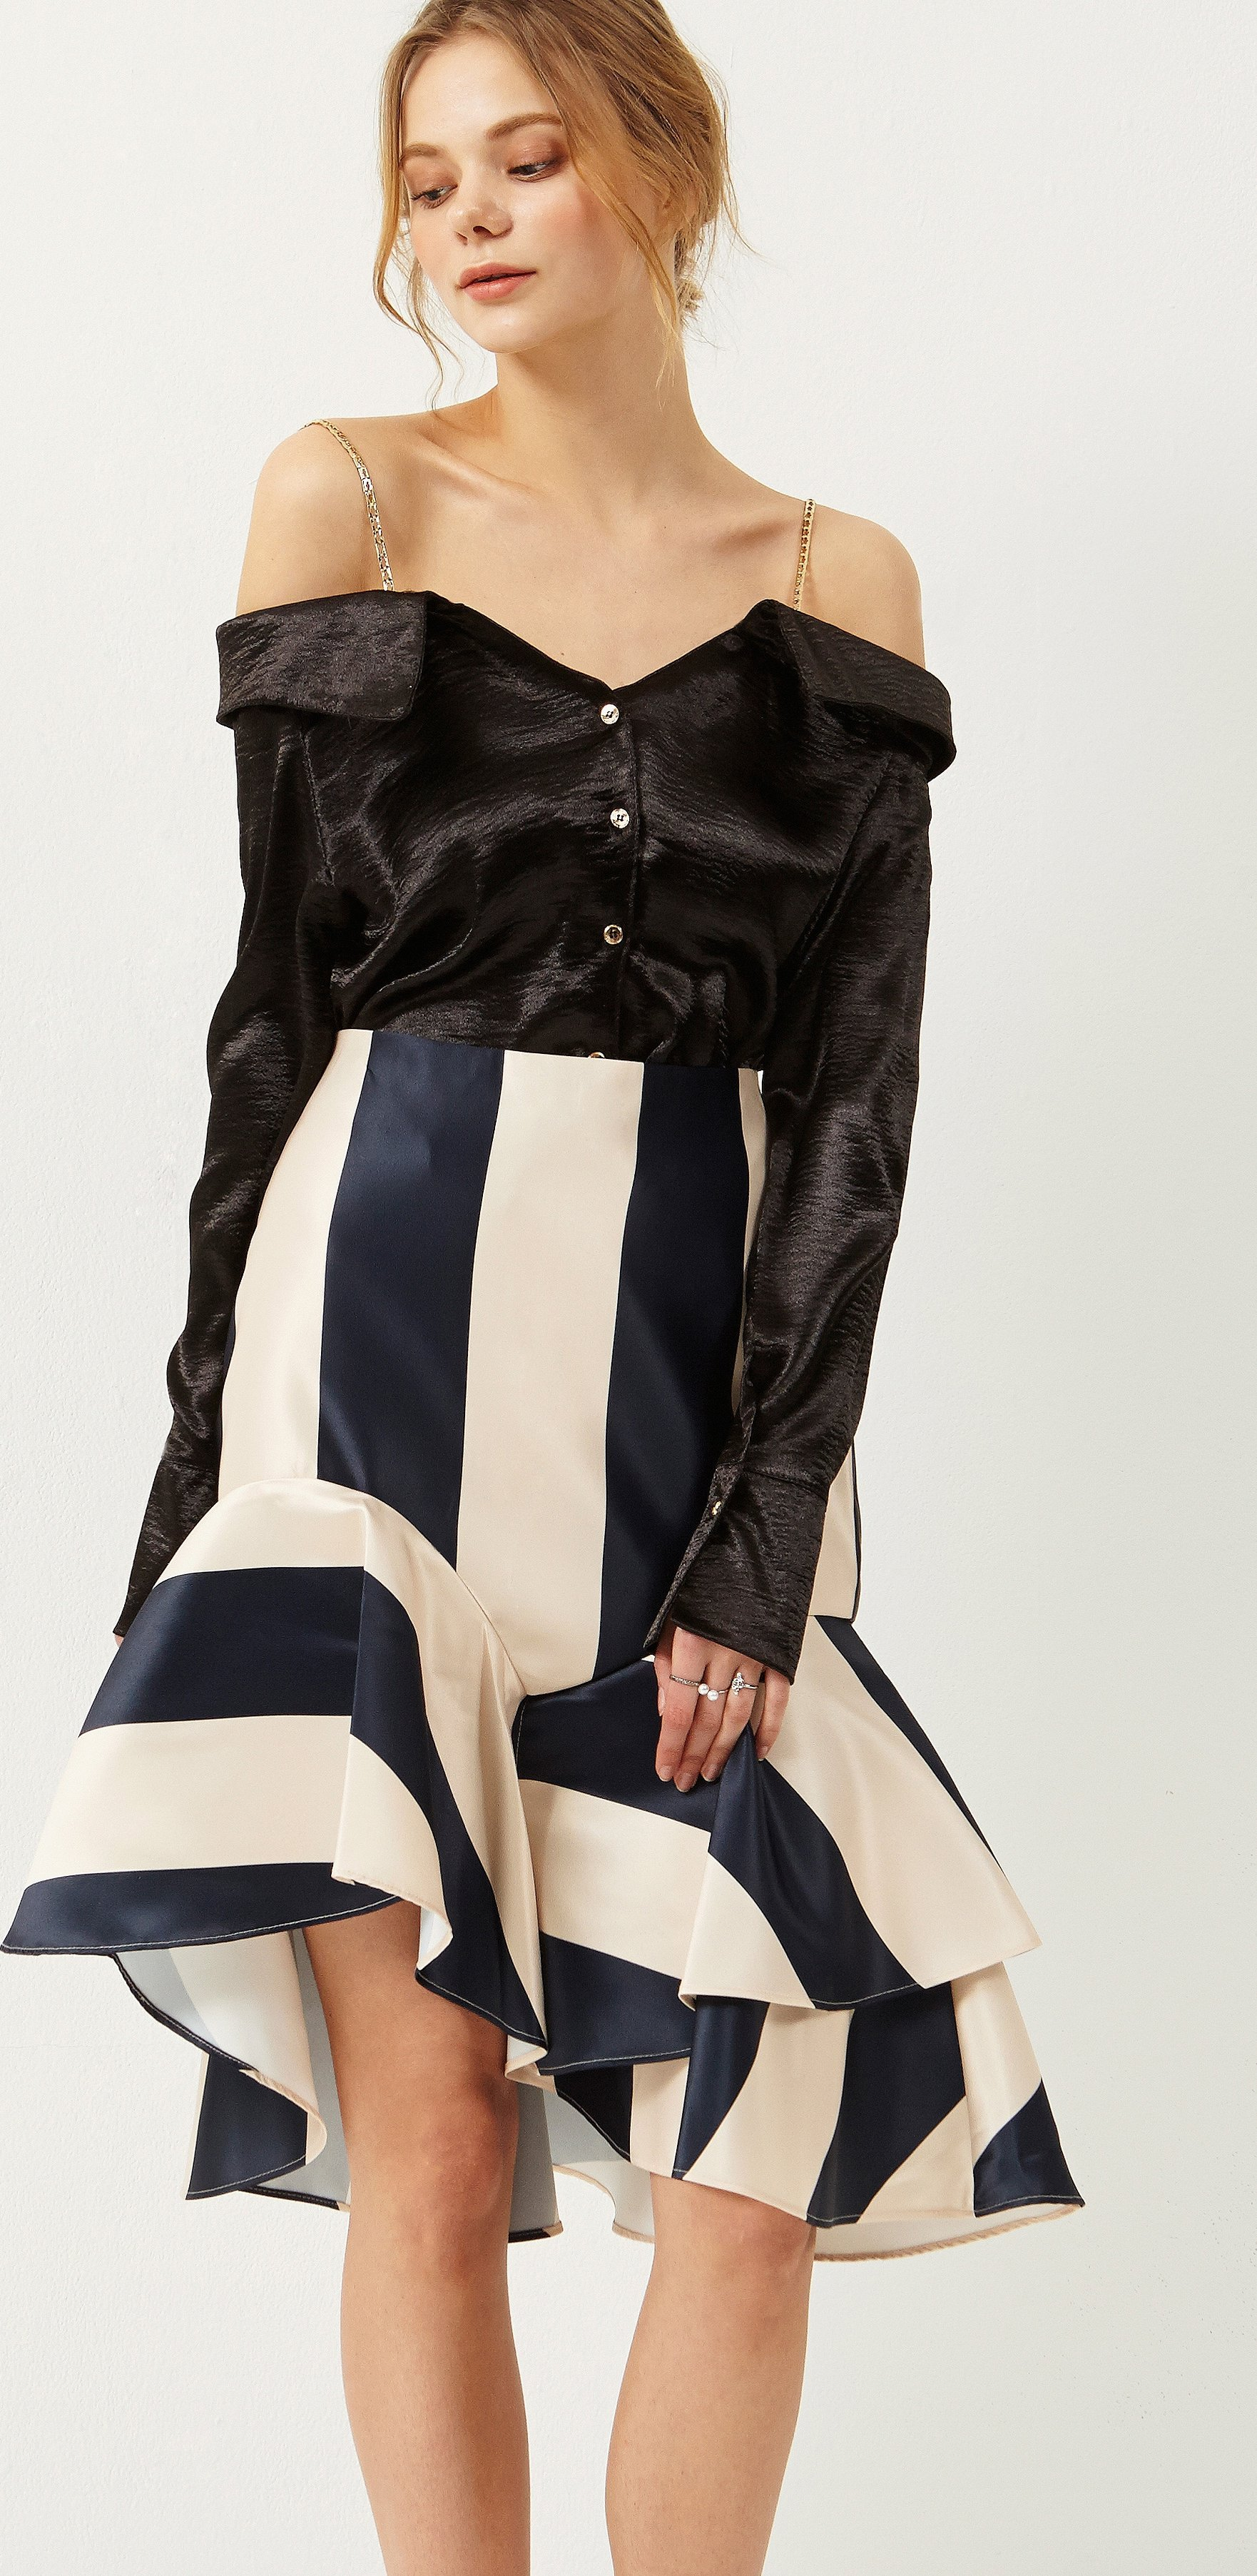 Alice+olivia платье черное